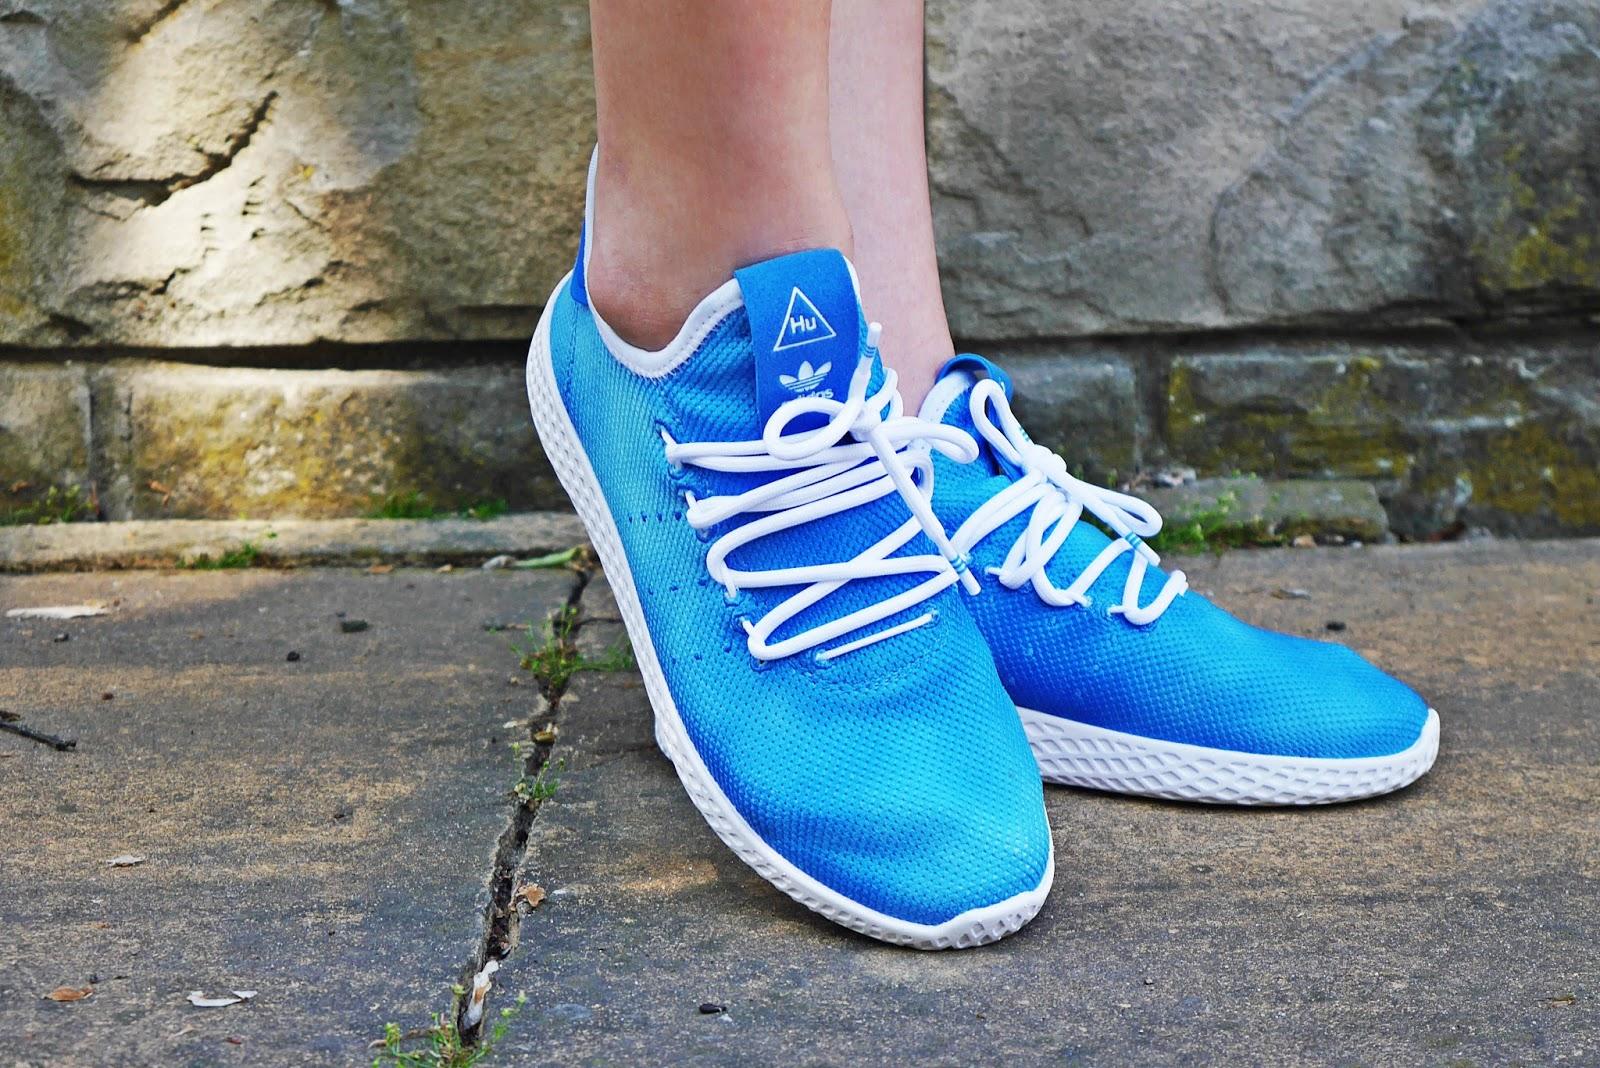 10_footway_adidas_pharell_williams_holi_hu_tennis_blue_sukienka_koronkowa-jeansowa_kurtka_140518